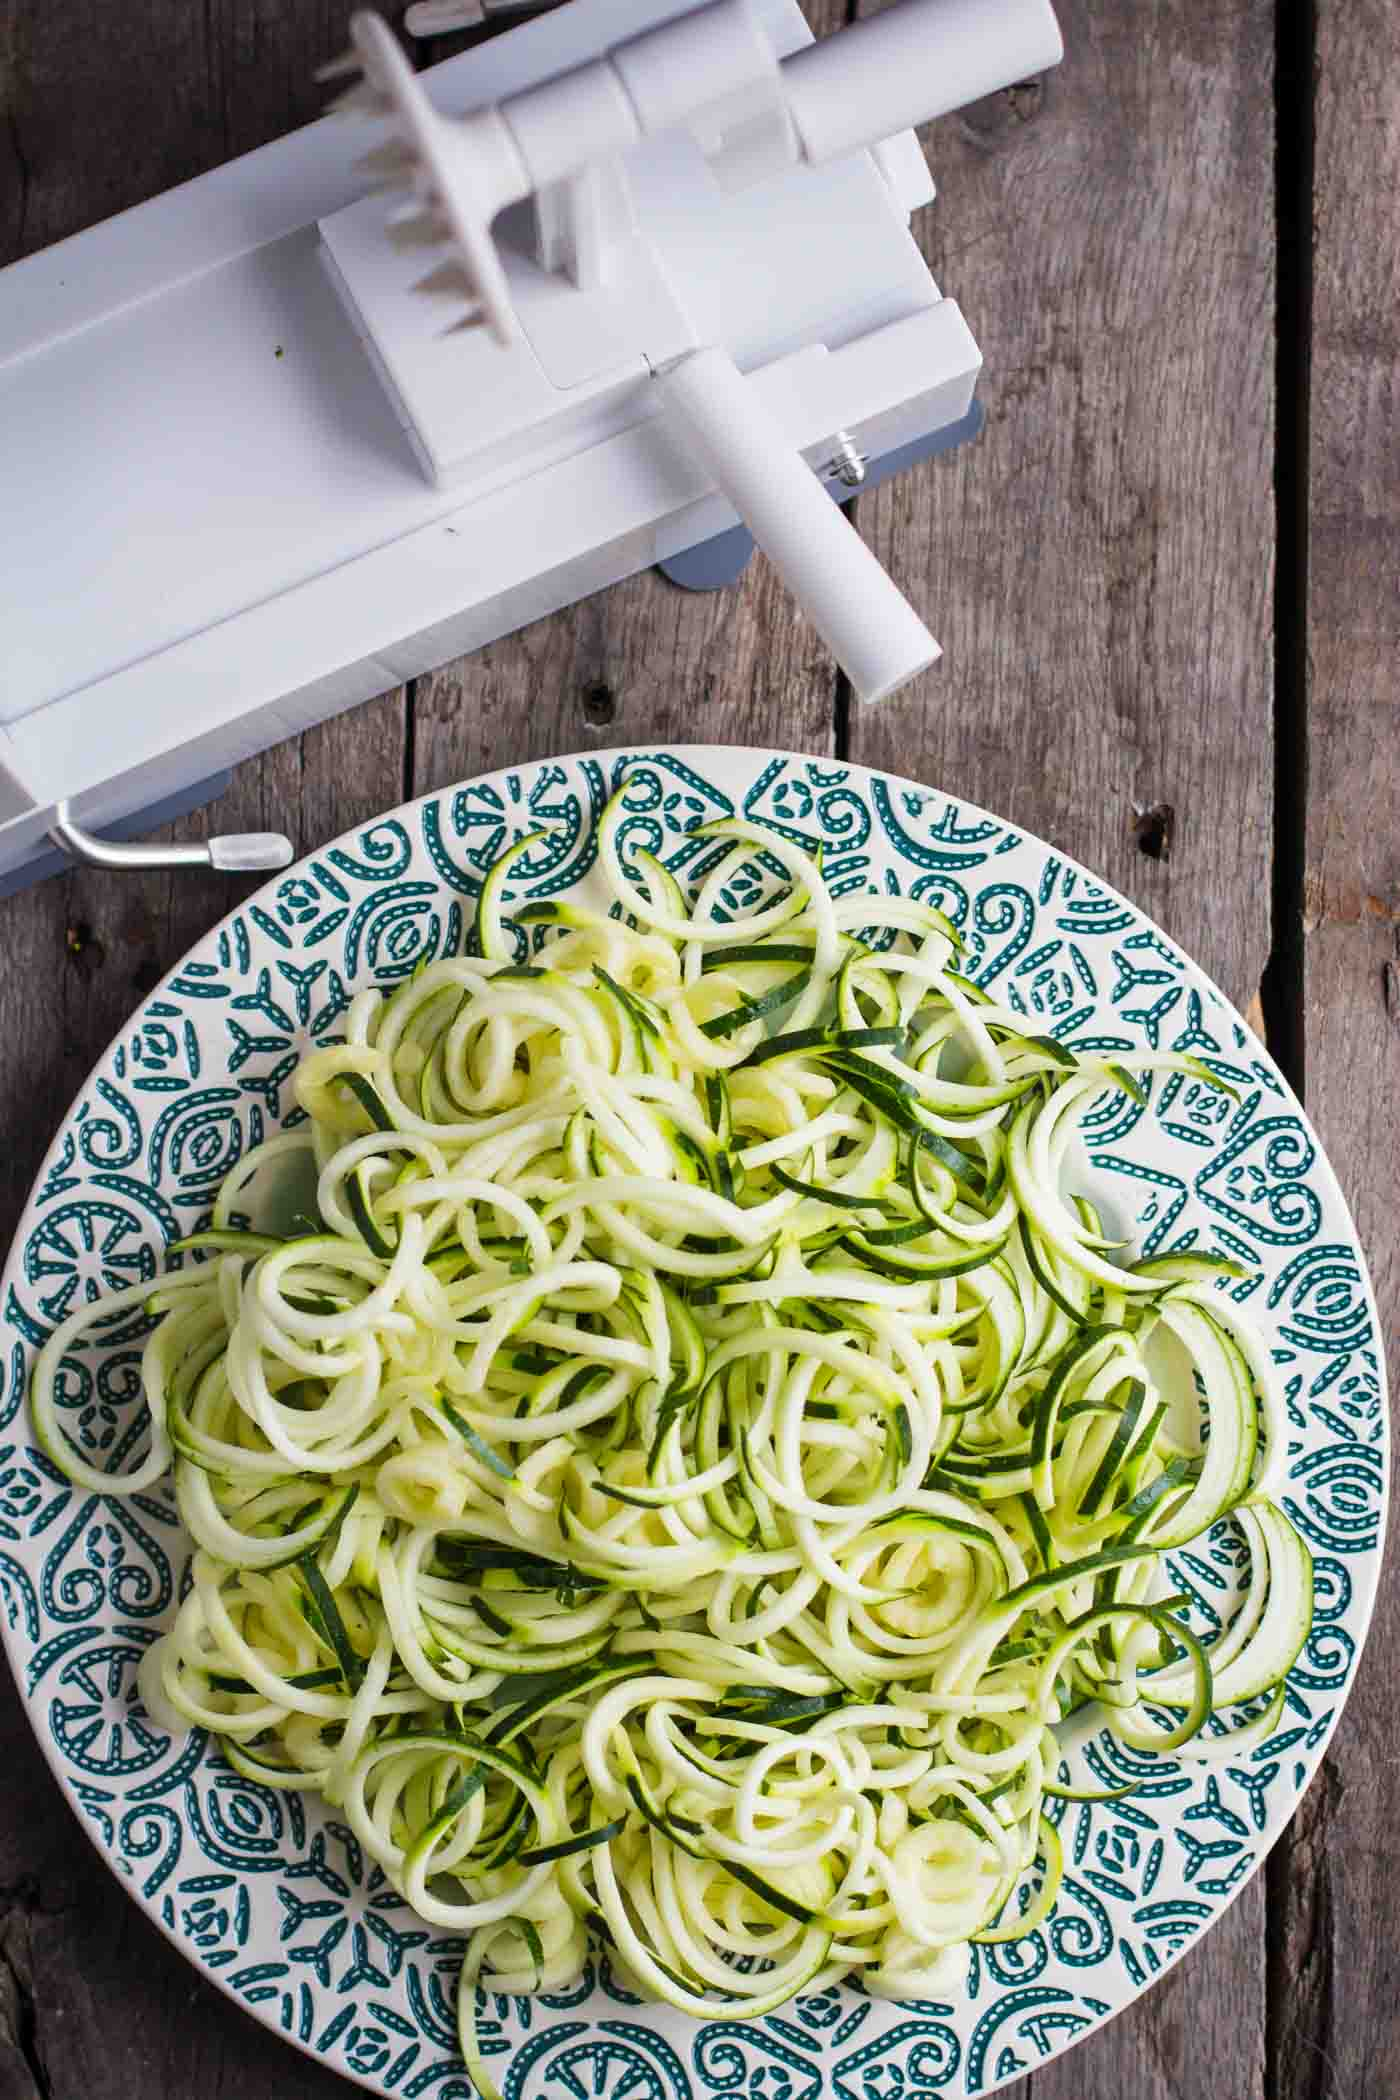 Spiralized Zucchini Noodles using the Insiralizer